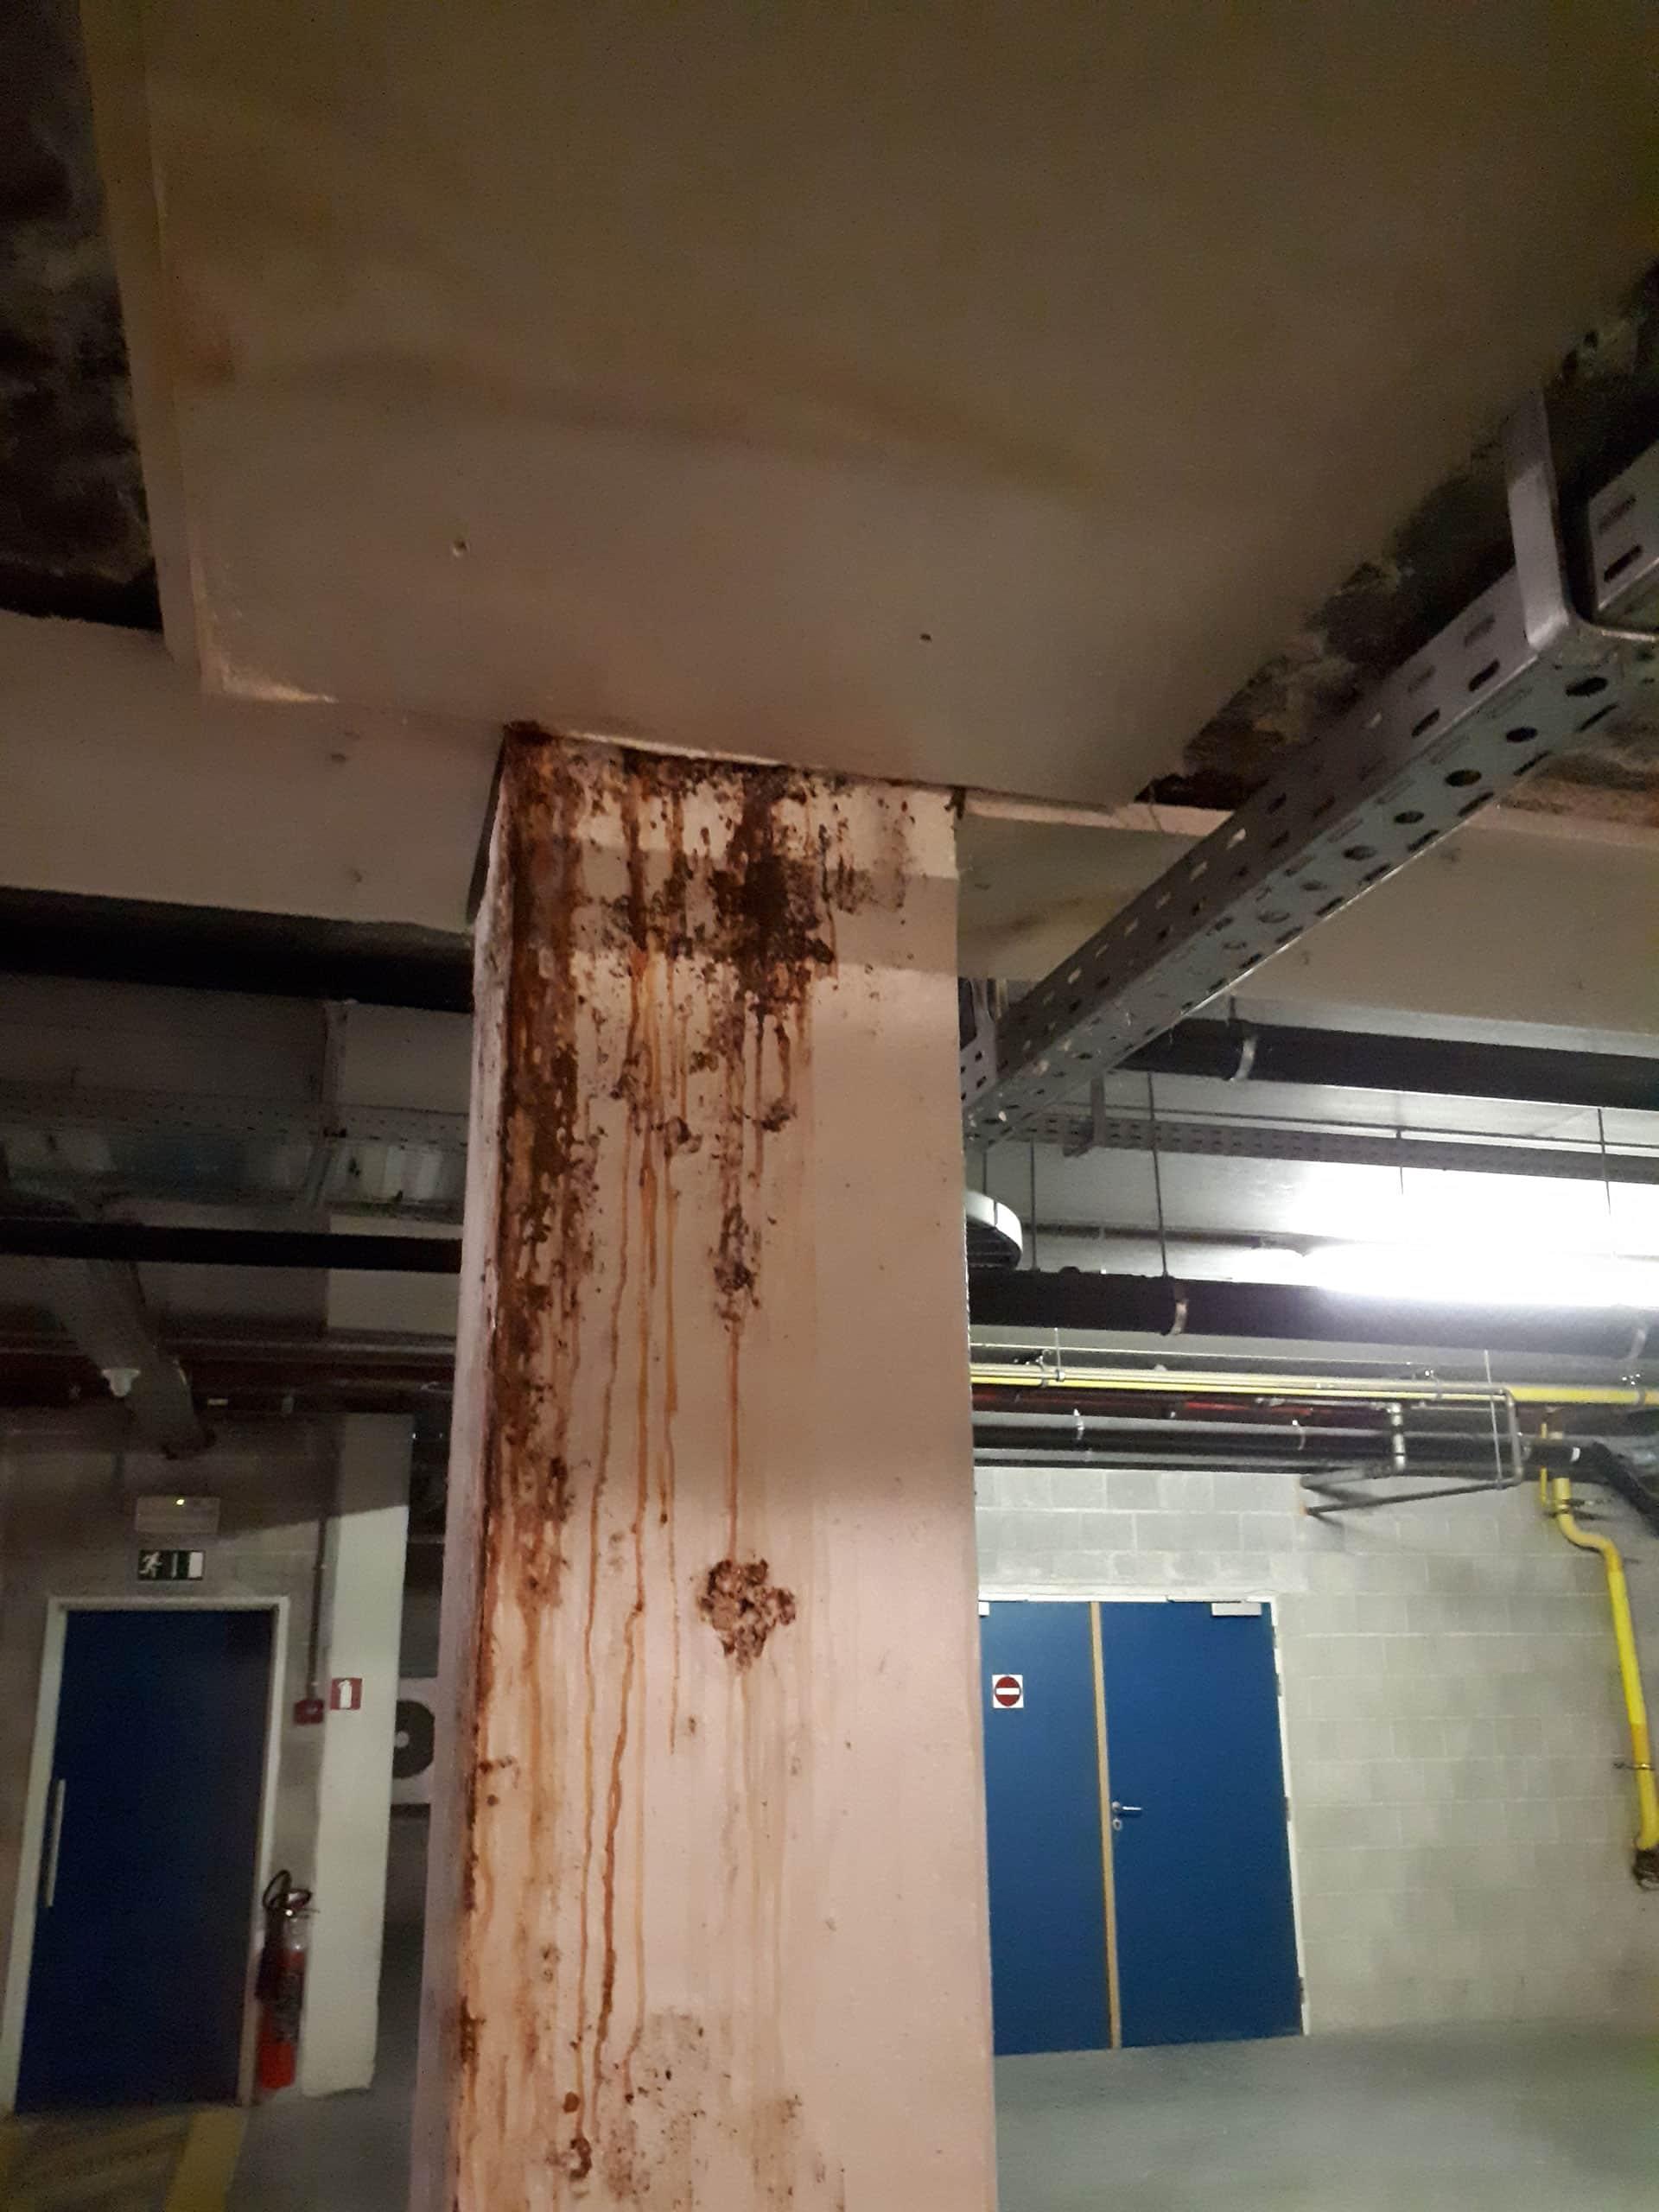 Detecting leaks in parking garages